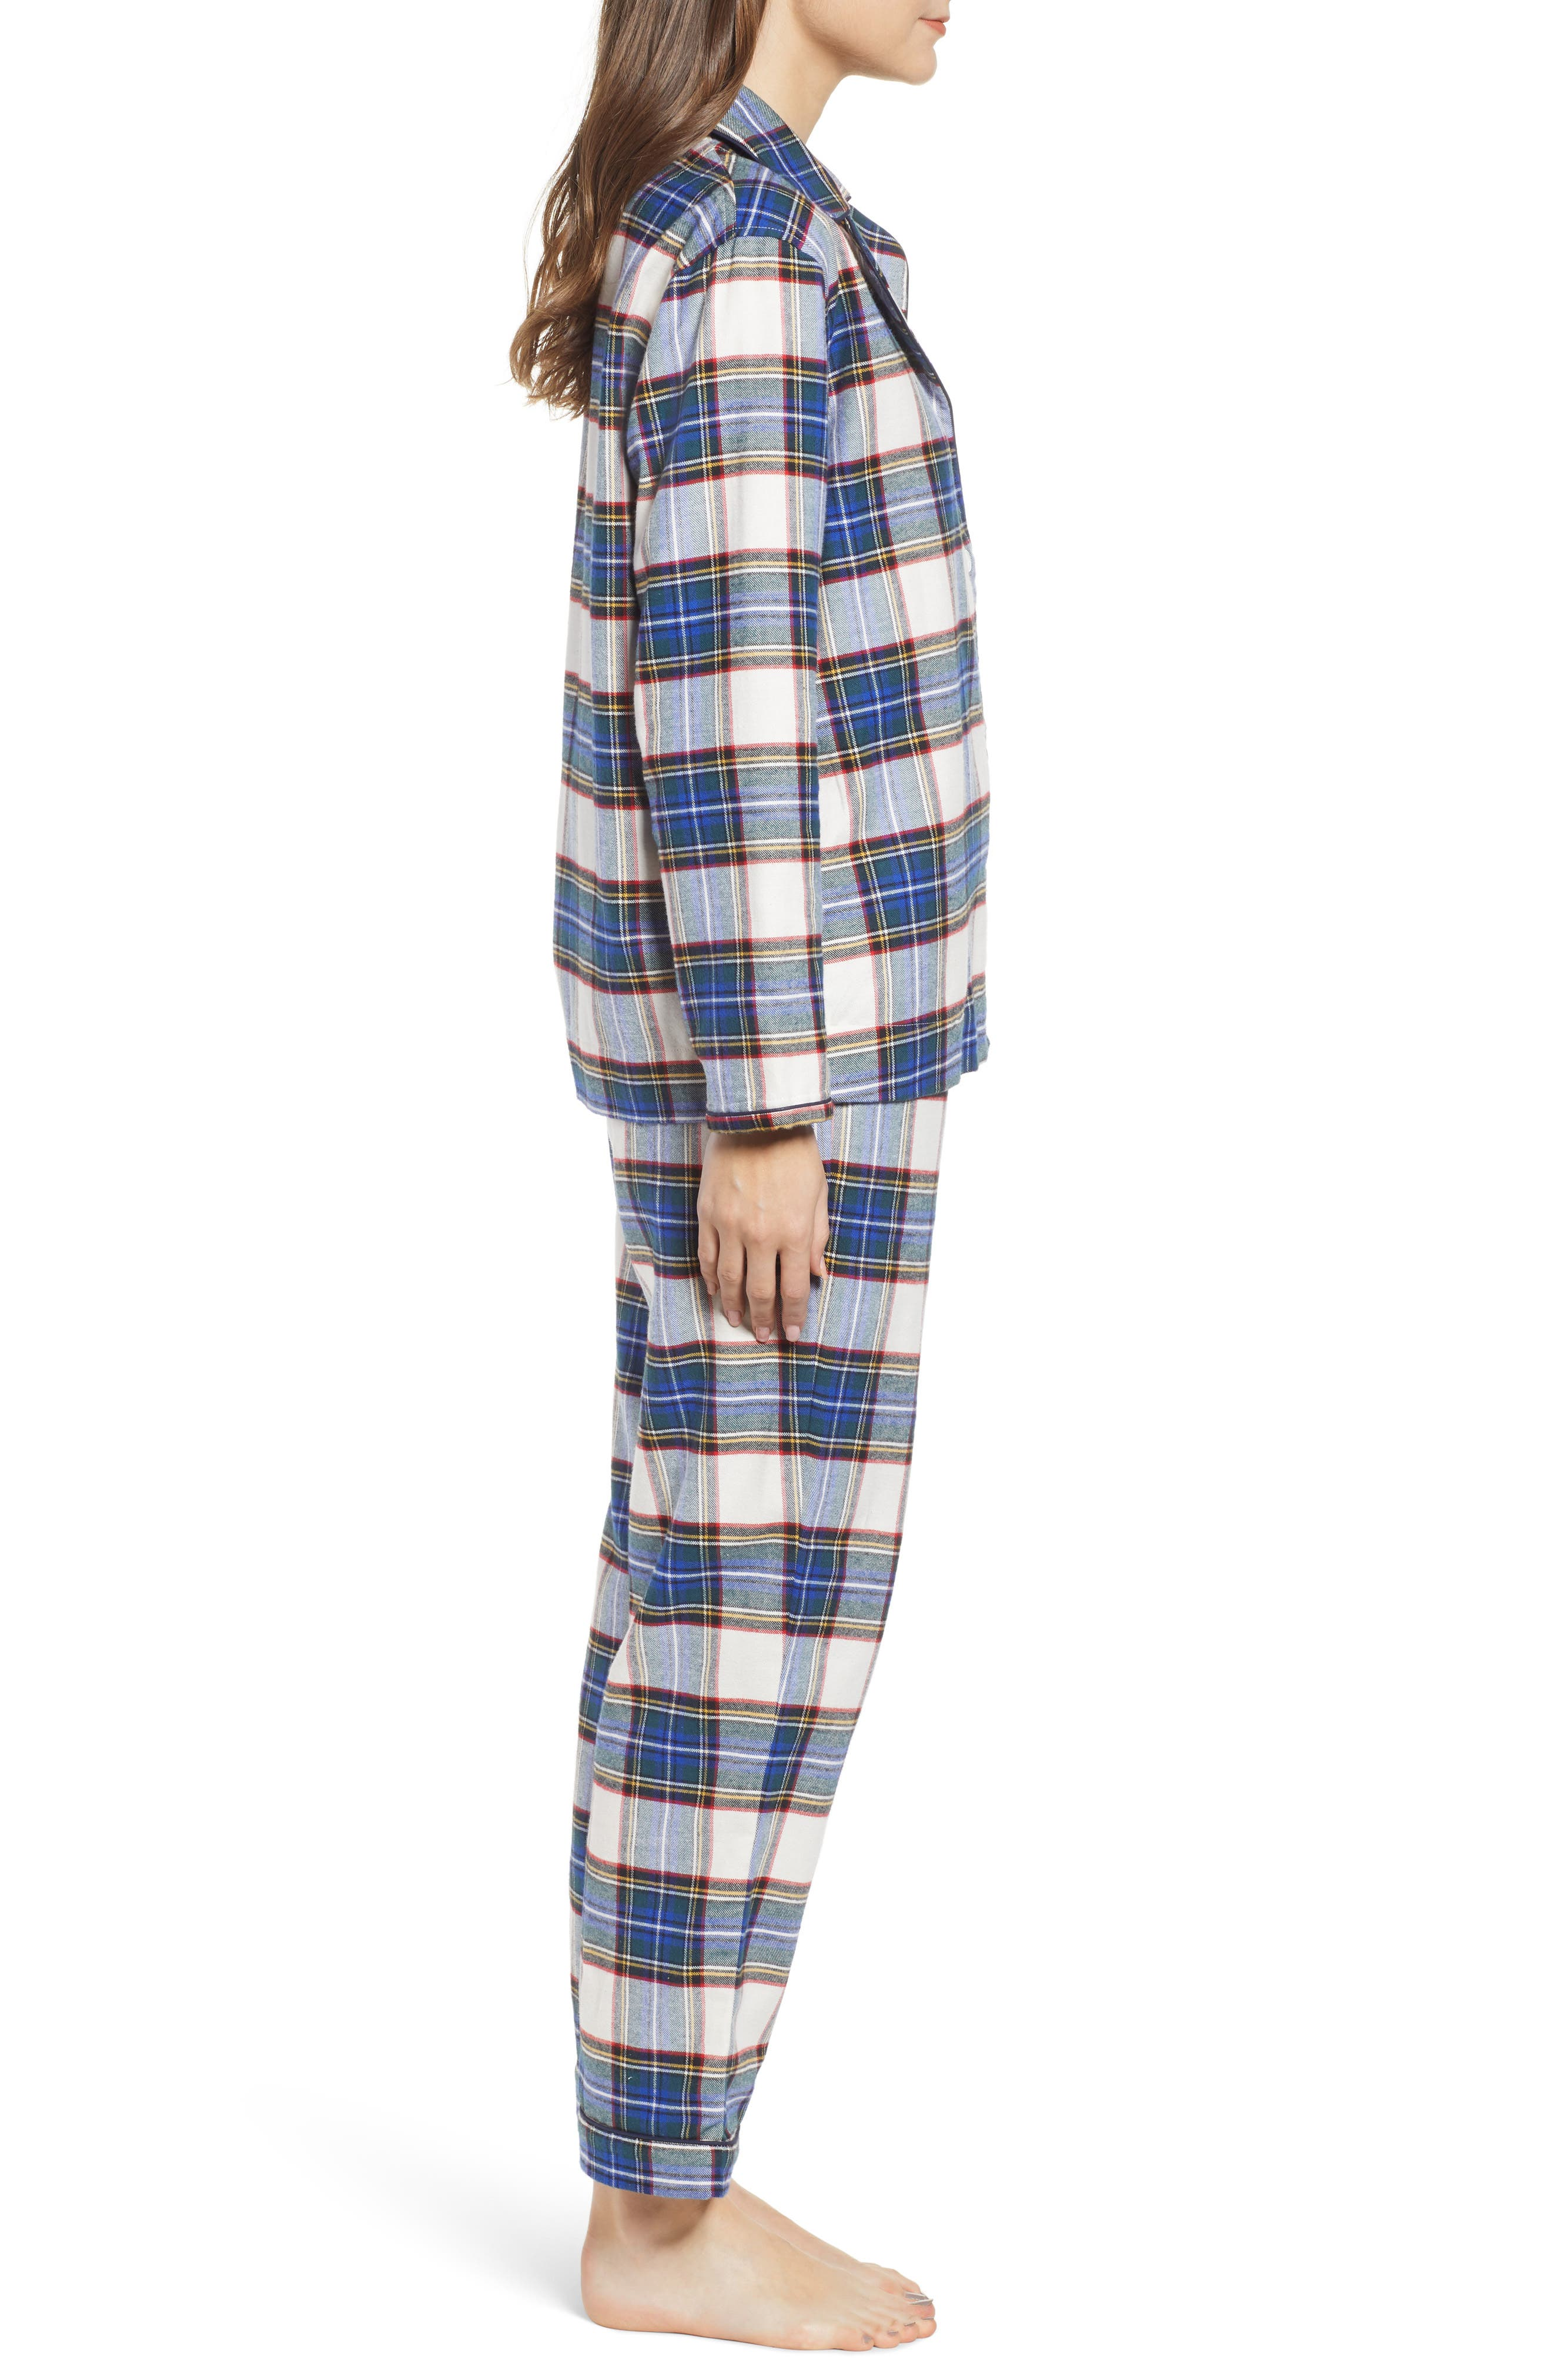 Bishop Women's Pajamas,                             Alternate thumbnail 3, color,                             FLANNEL PLAID